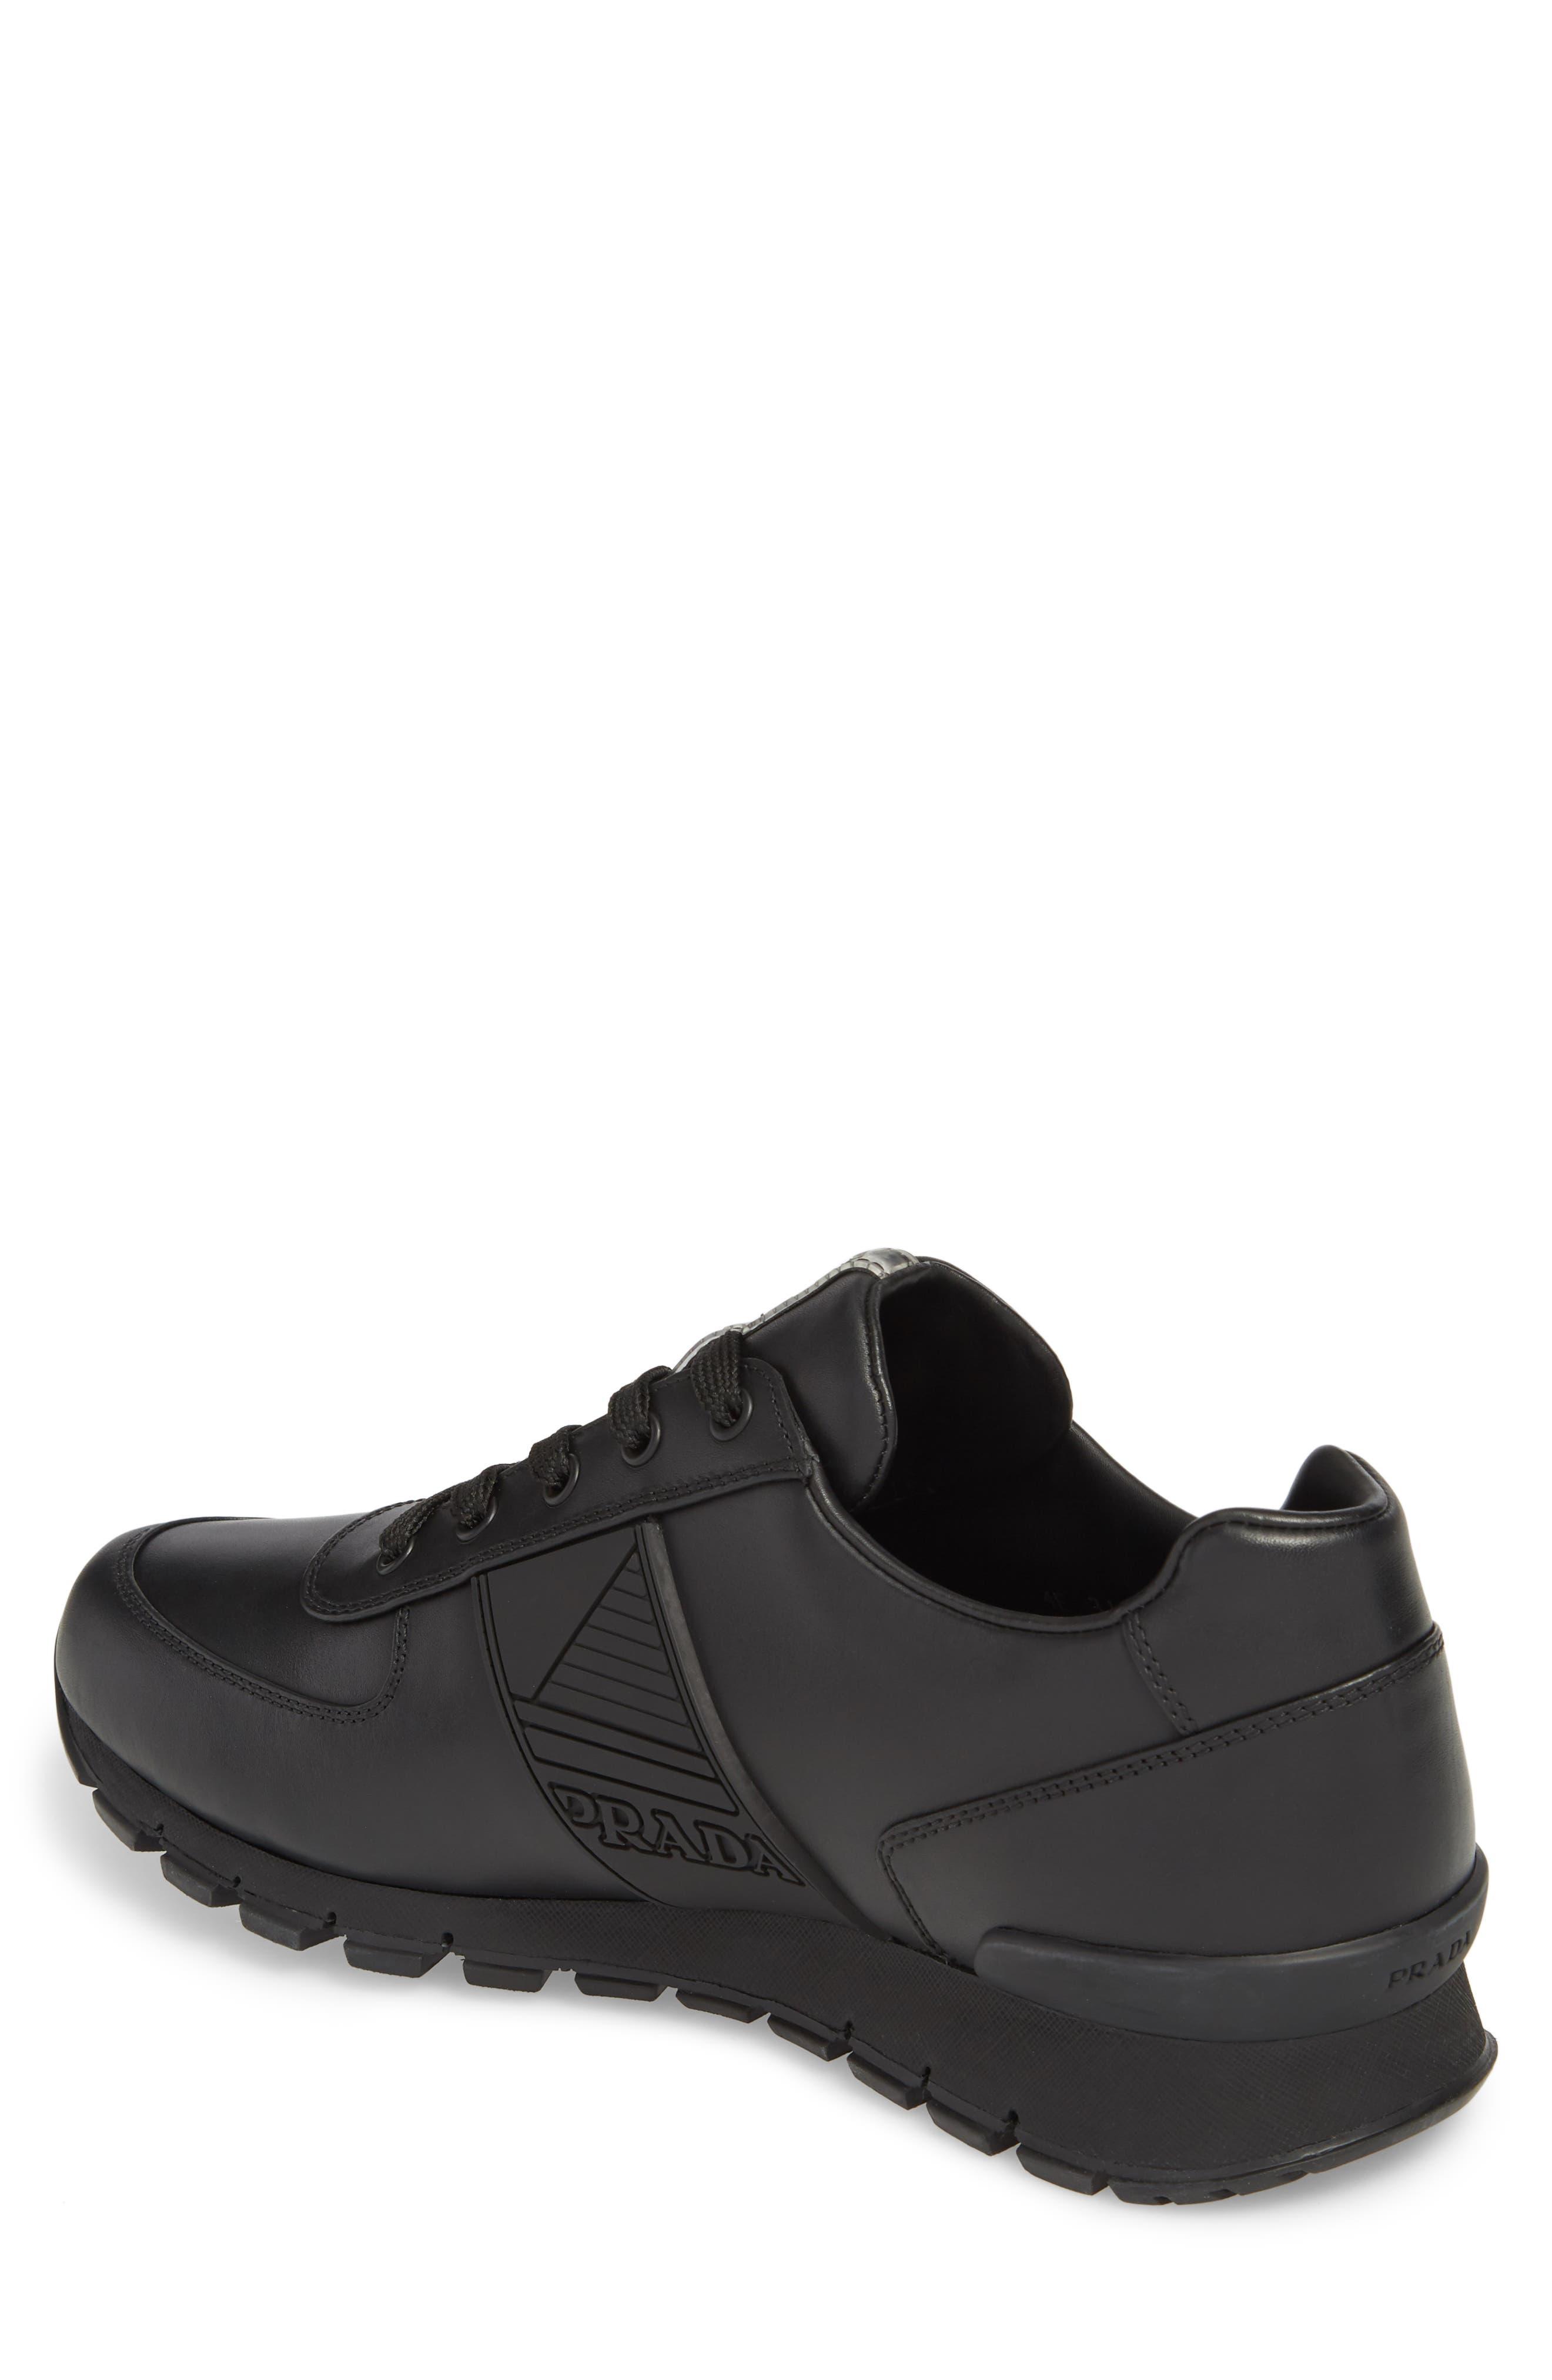 Linea Rossa Sneaker,                             Alternate thumbnail 2, color,                             NERO